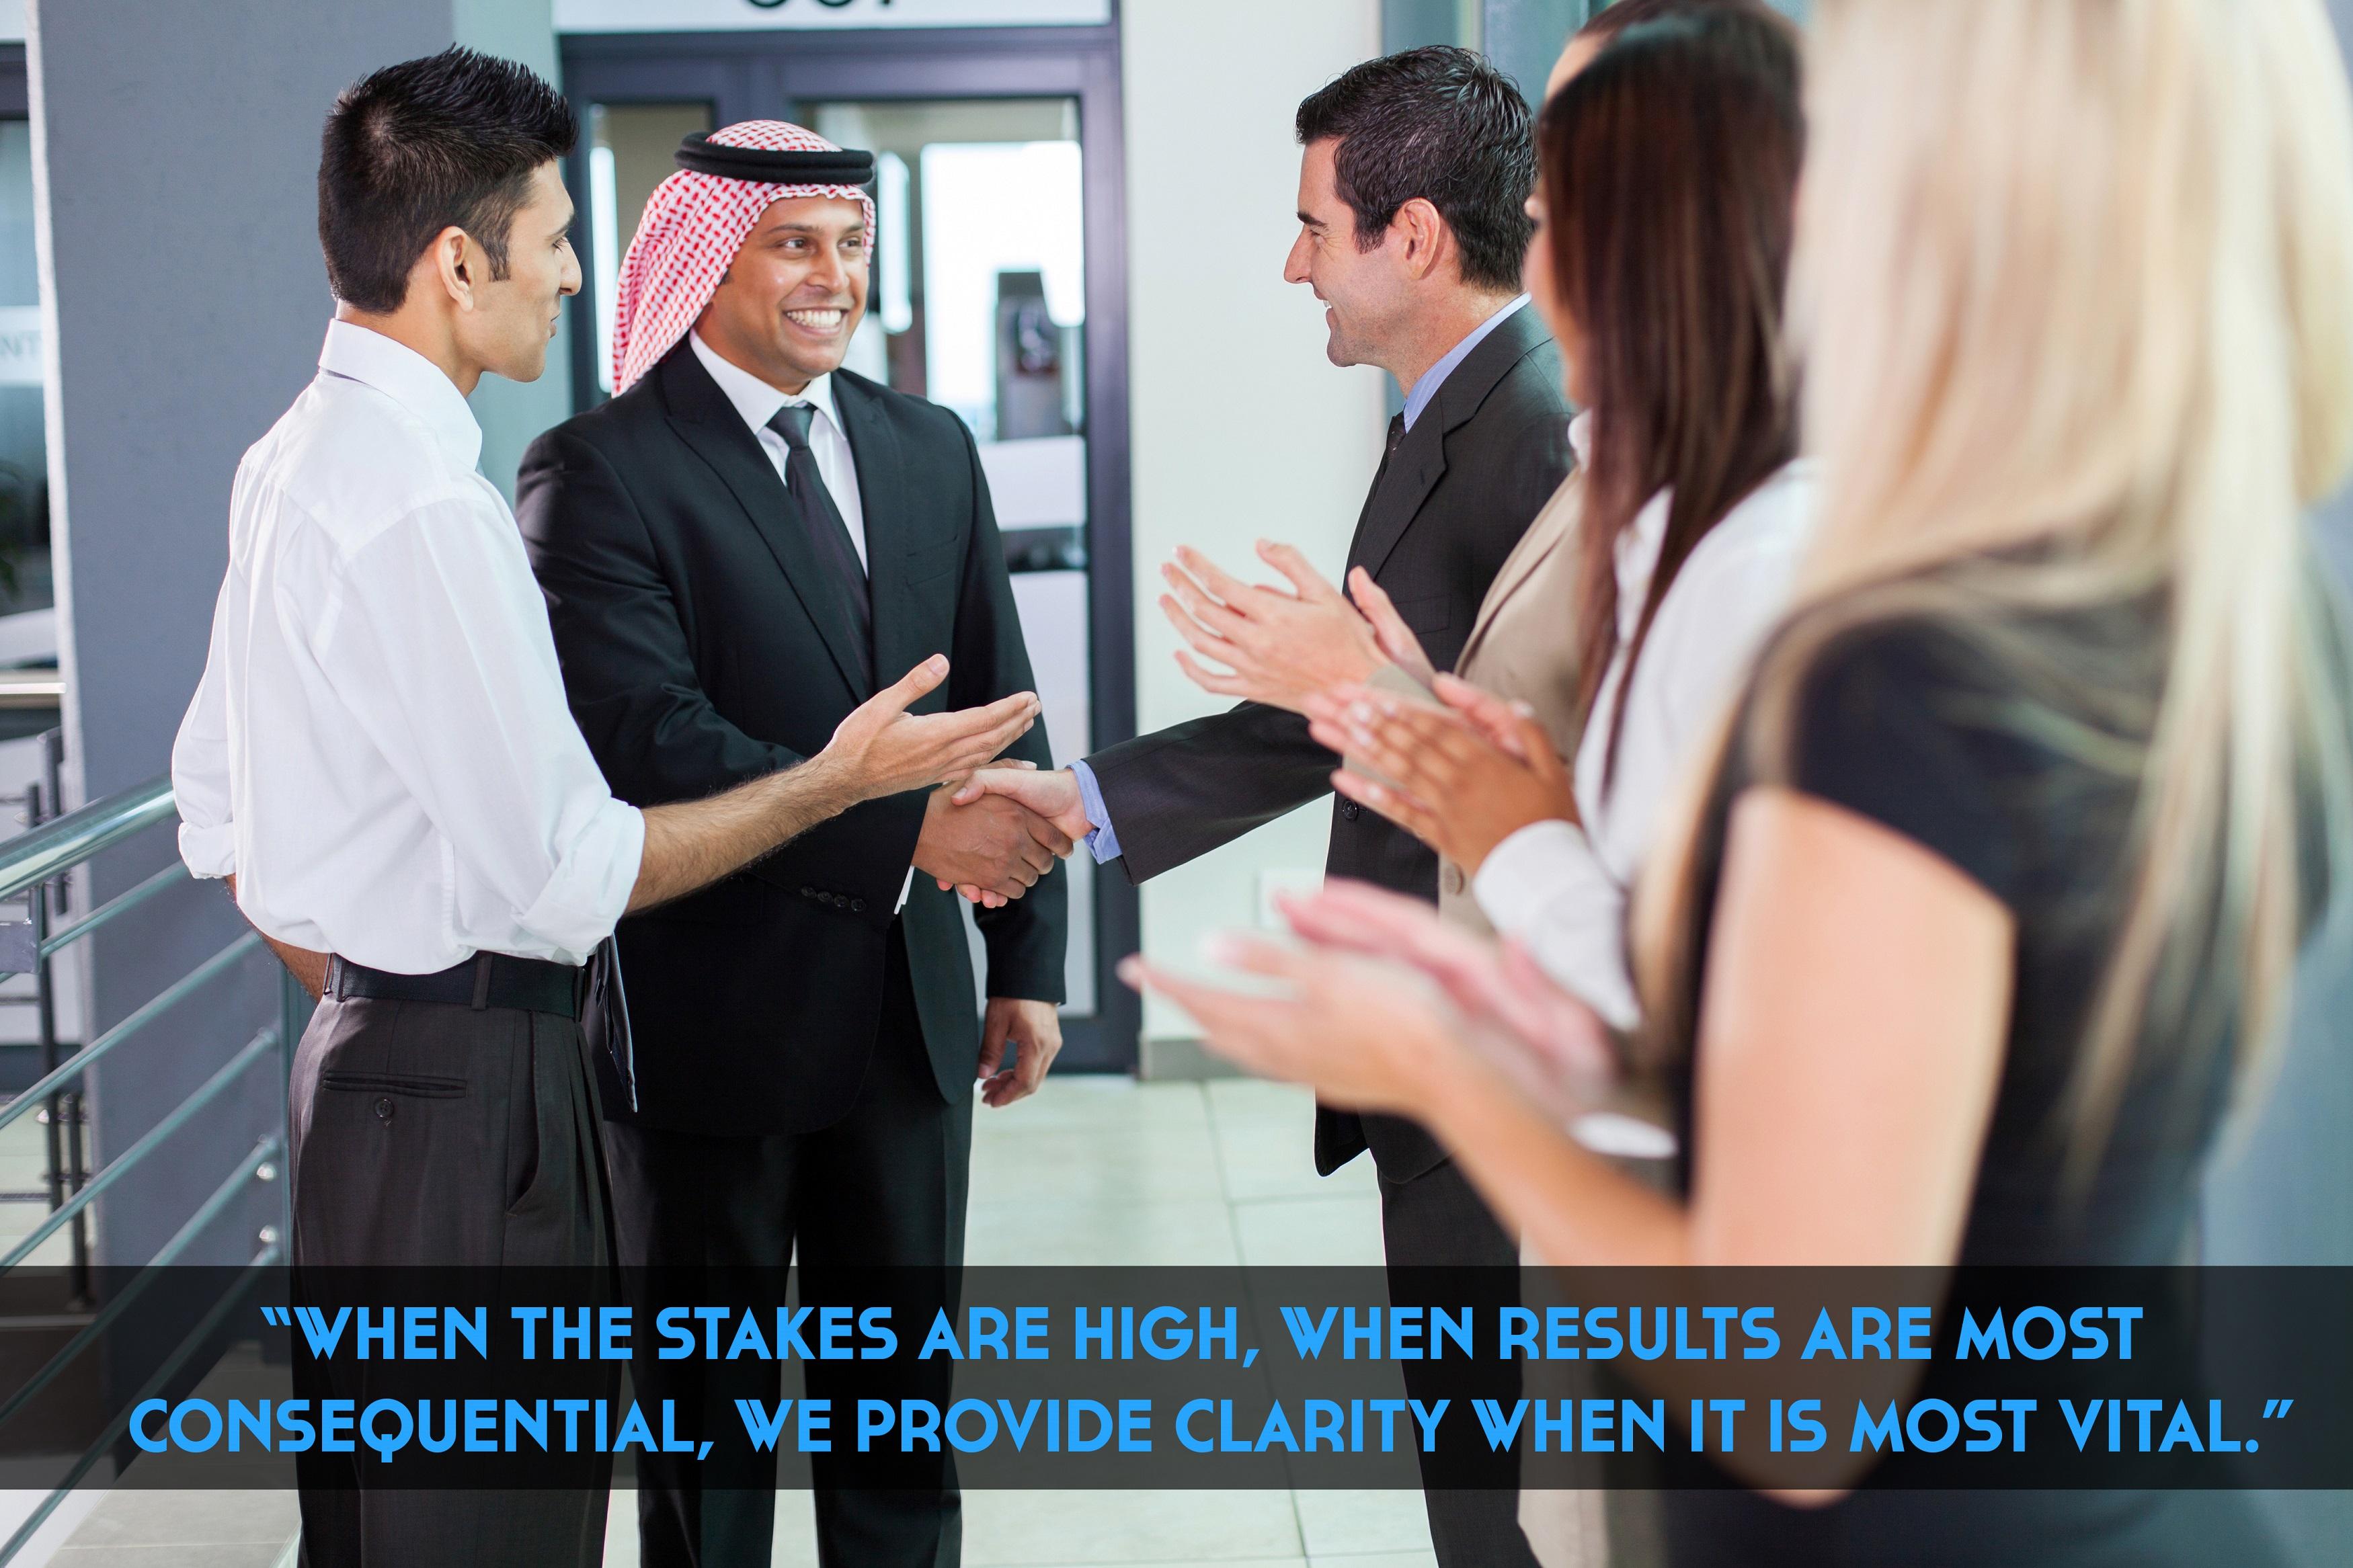 translator introducing arabian businessman to business partners